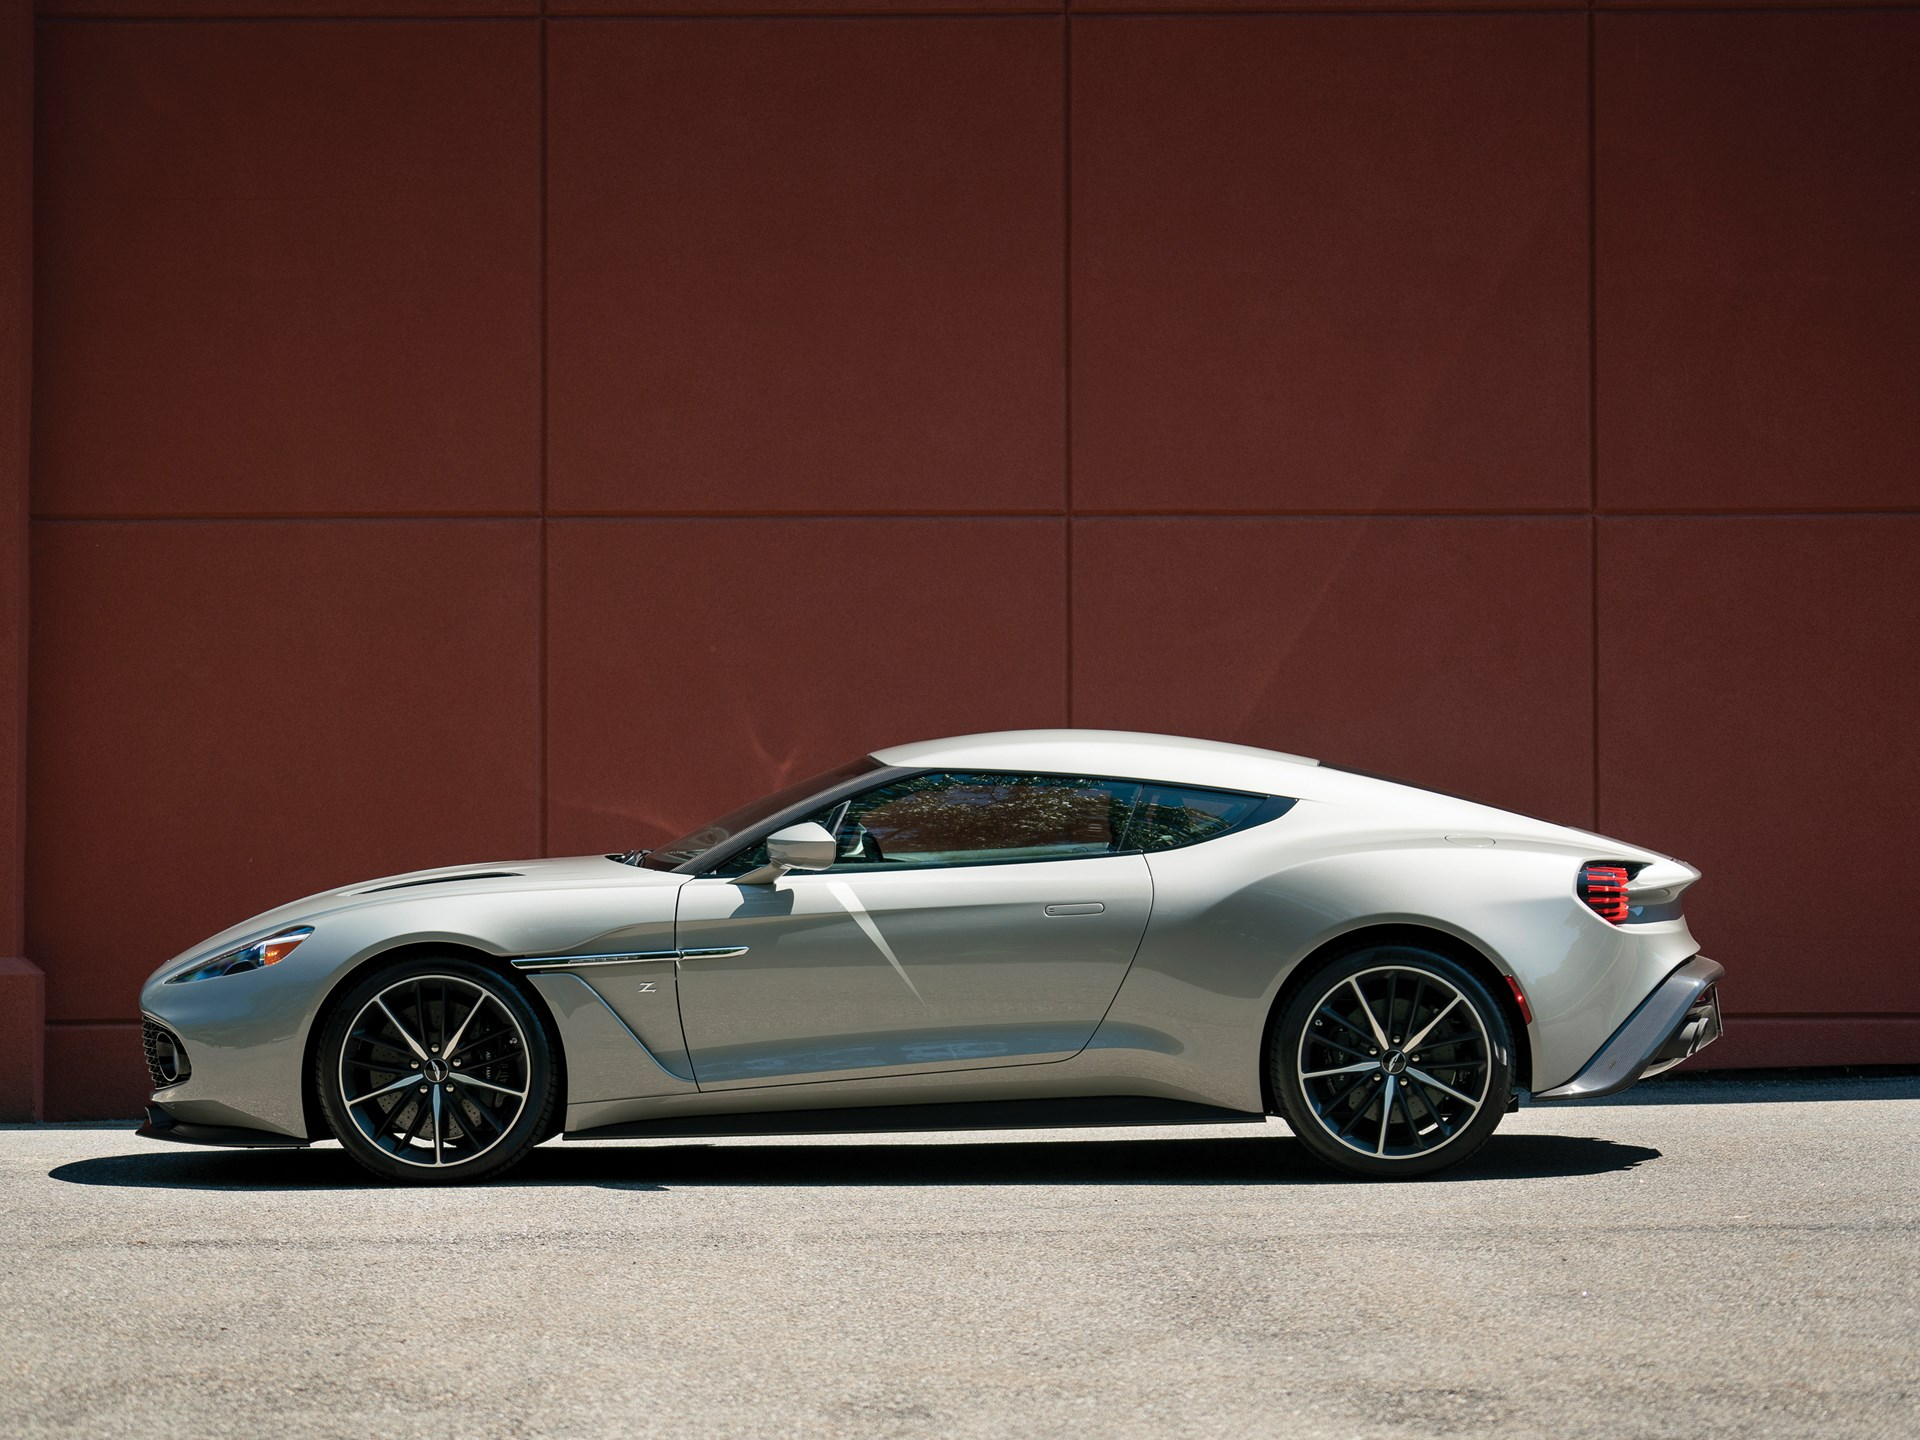 2017 Aston Martin Vanquish Zagato Price